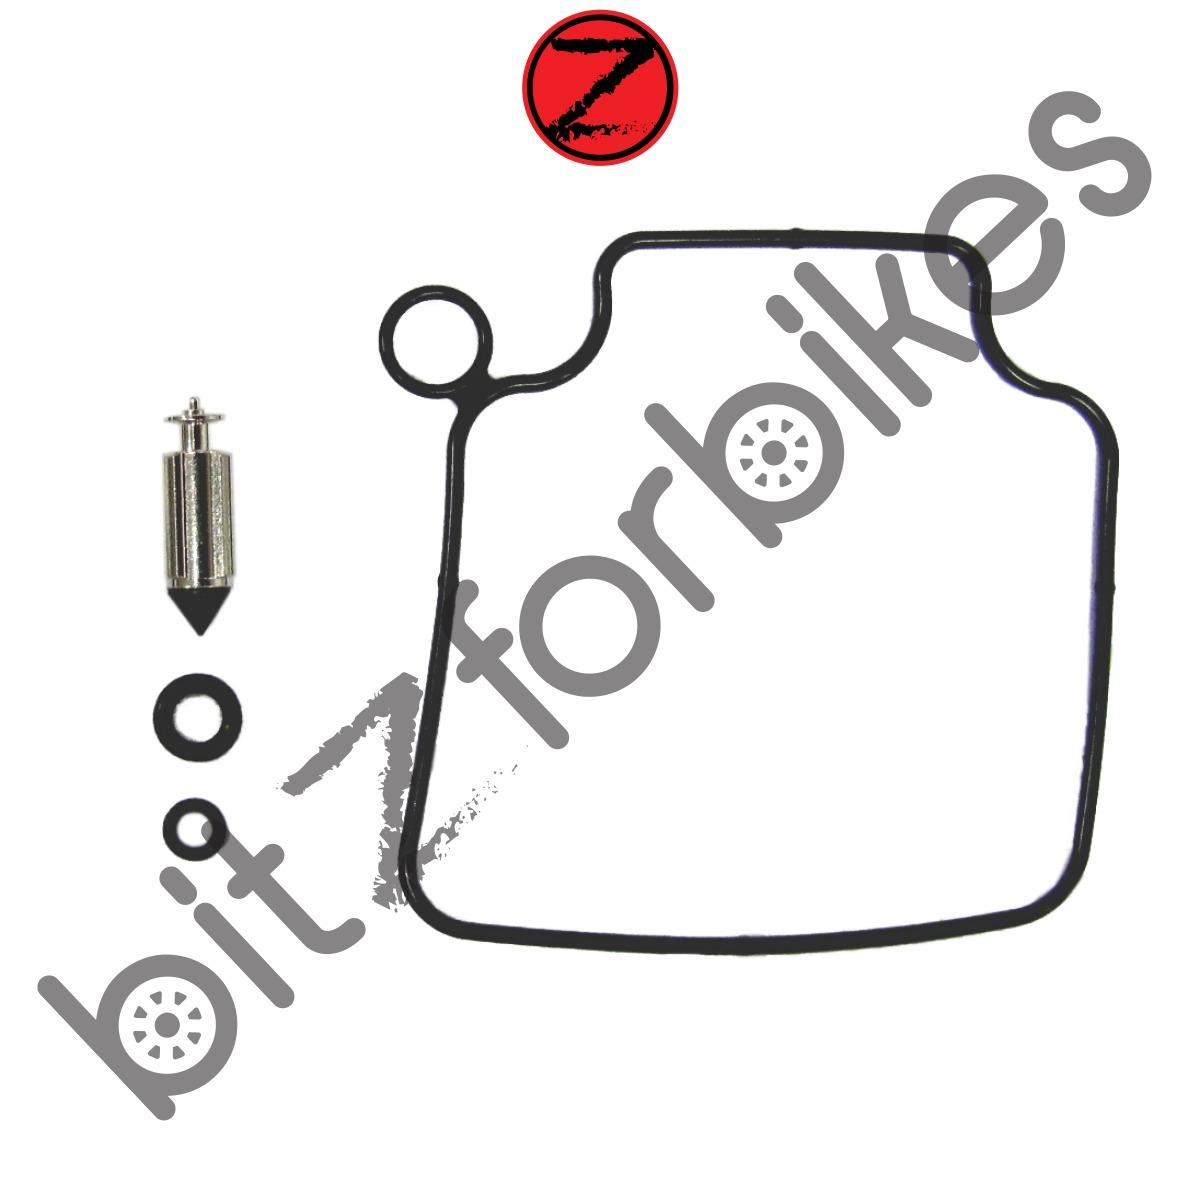 Carb Carburettor Repair Kit Honda TRX 350 FM1 Rancher 4x4